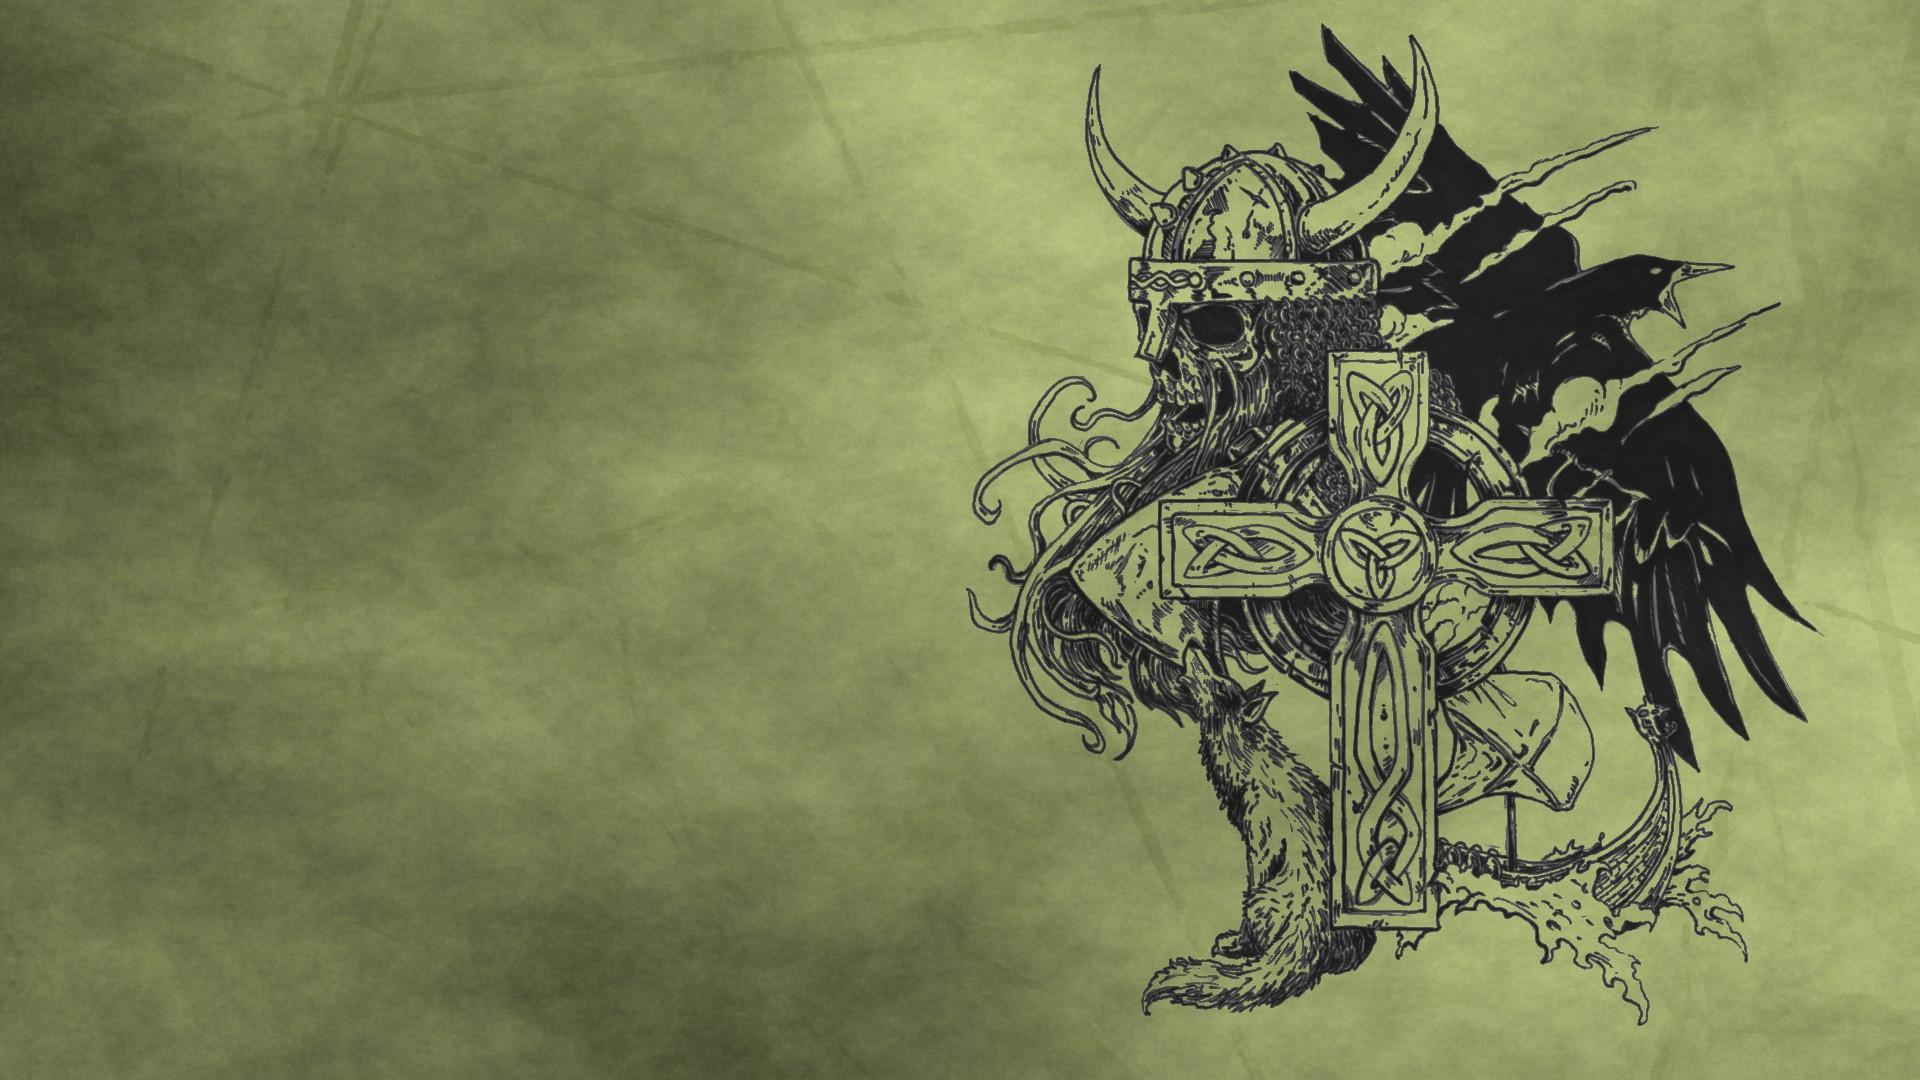 wallpaper viking wallpapers - photo #14